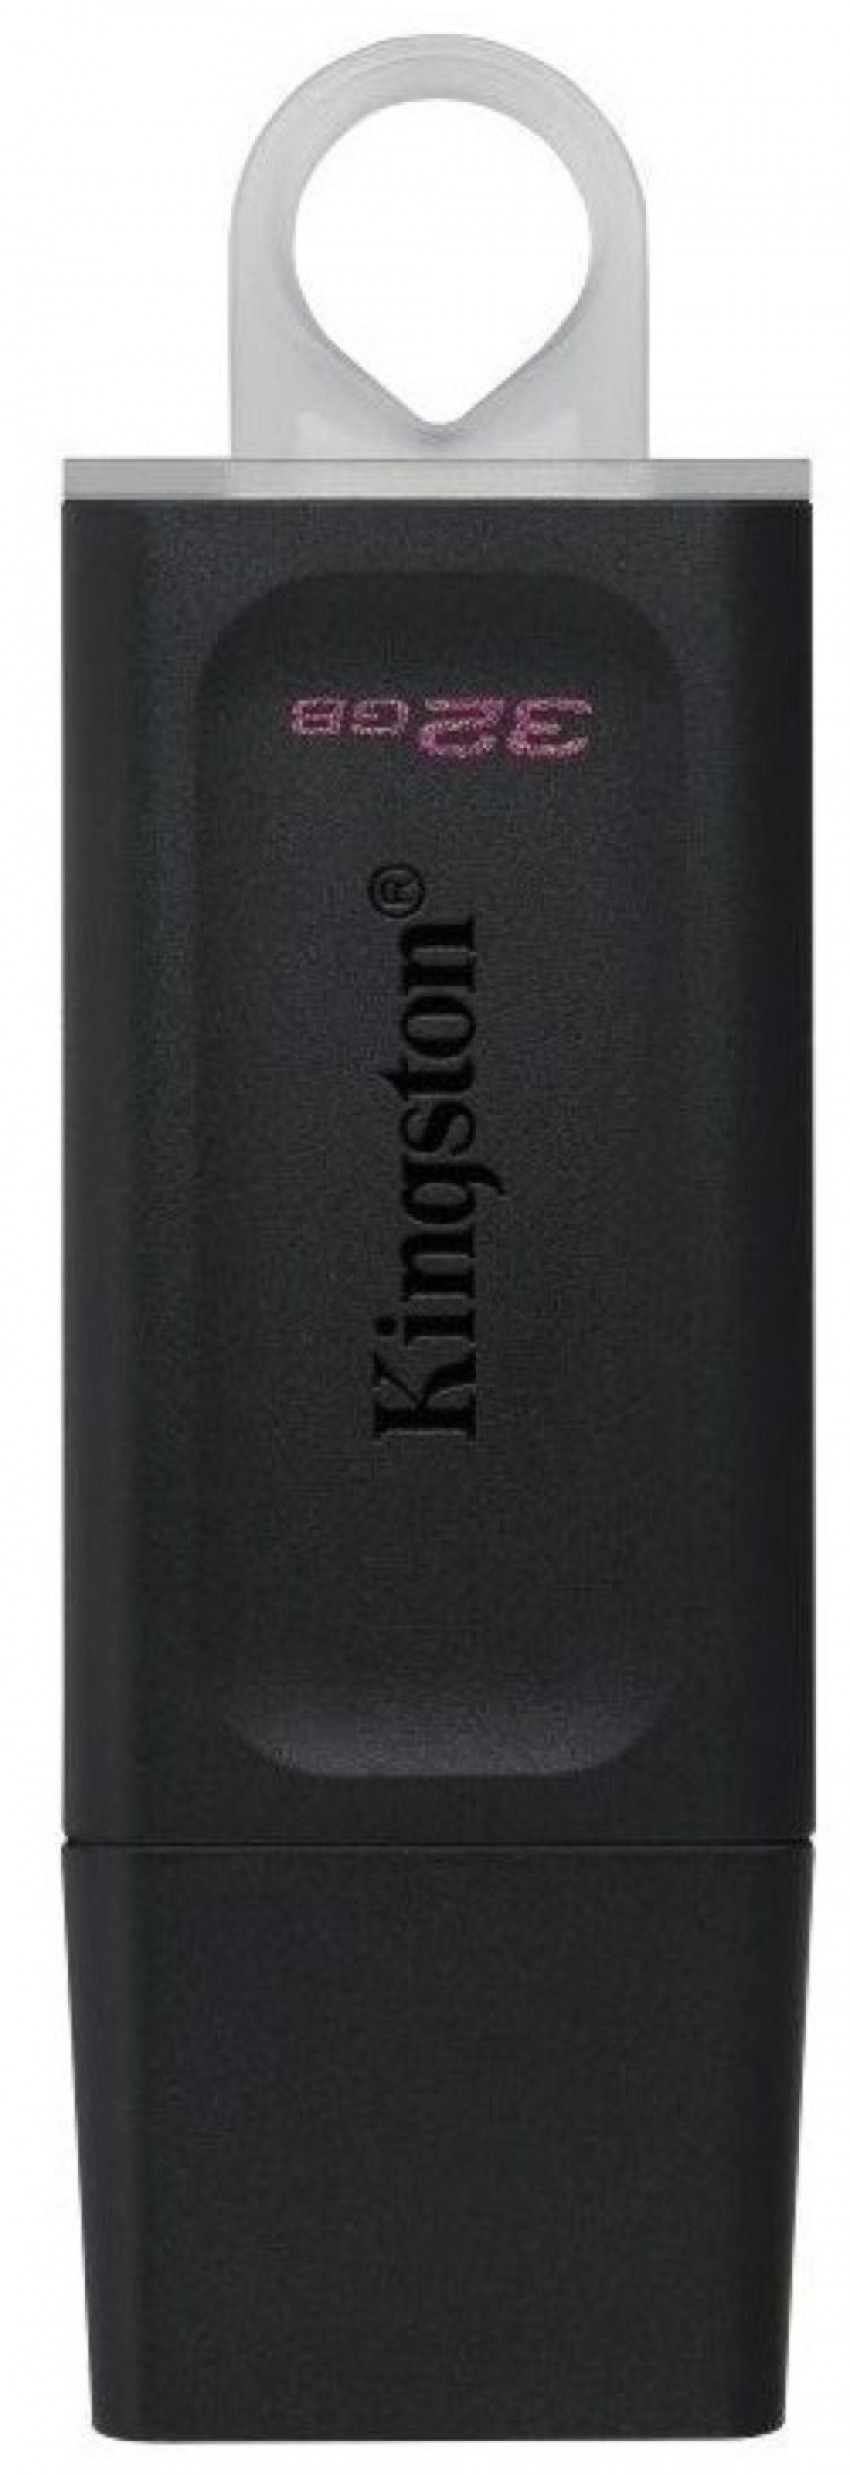 PENDRIVE 32GB USB 3.2 DATATRAVELER EXODIA NEGRO 7406173097206